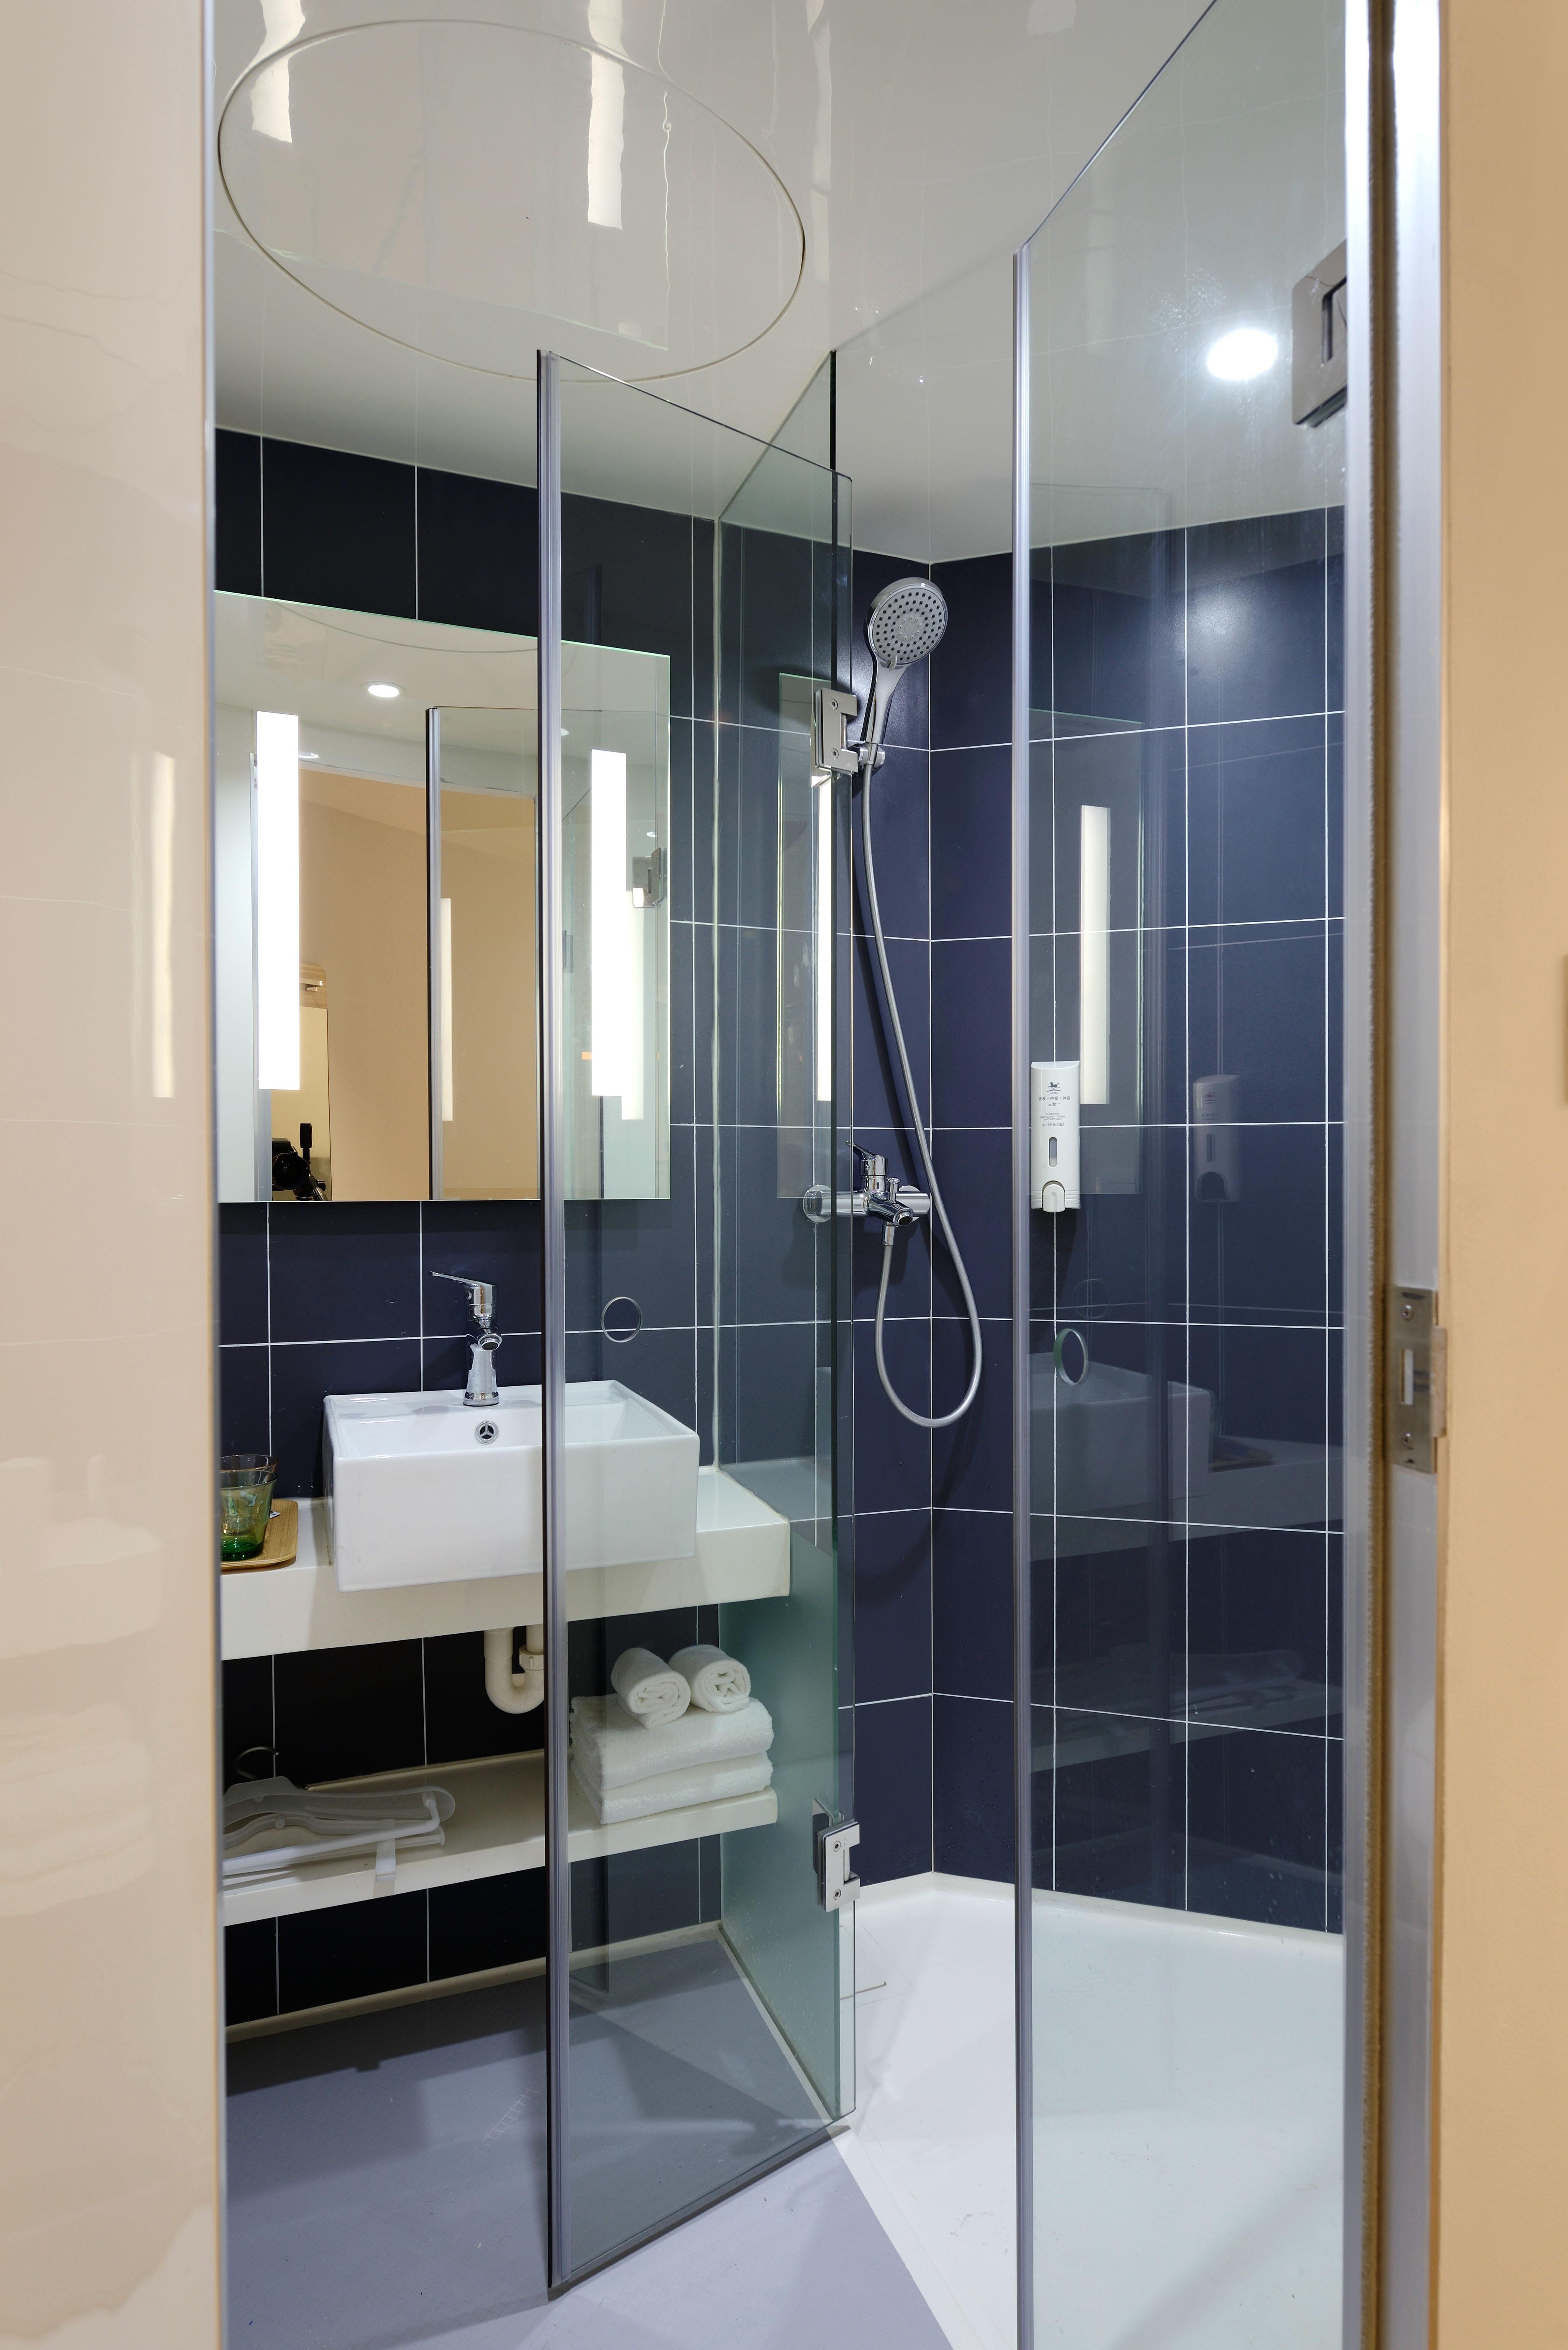 Free Images : floor, glass, interior design, bathroom, hotel, new ...